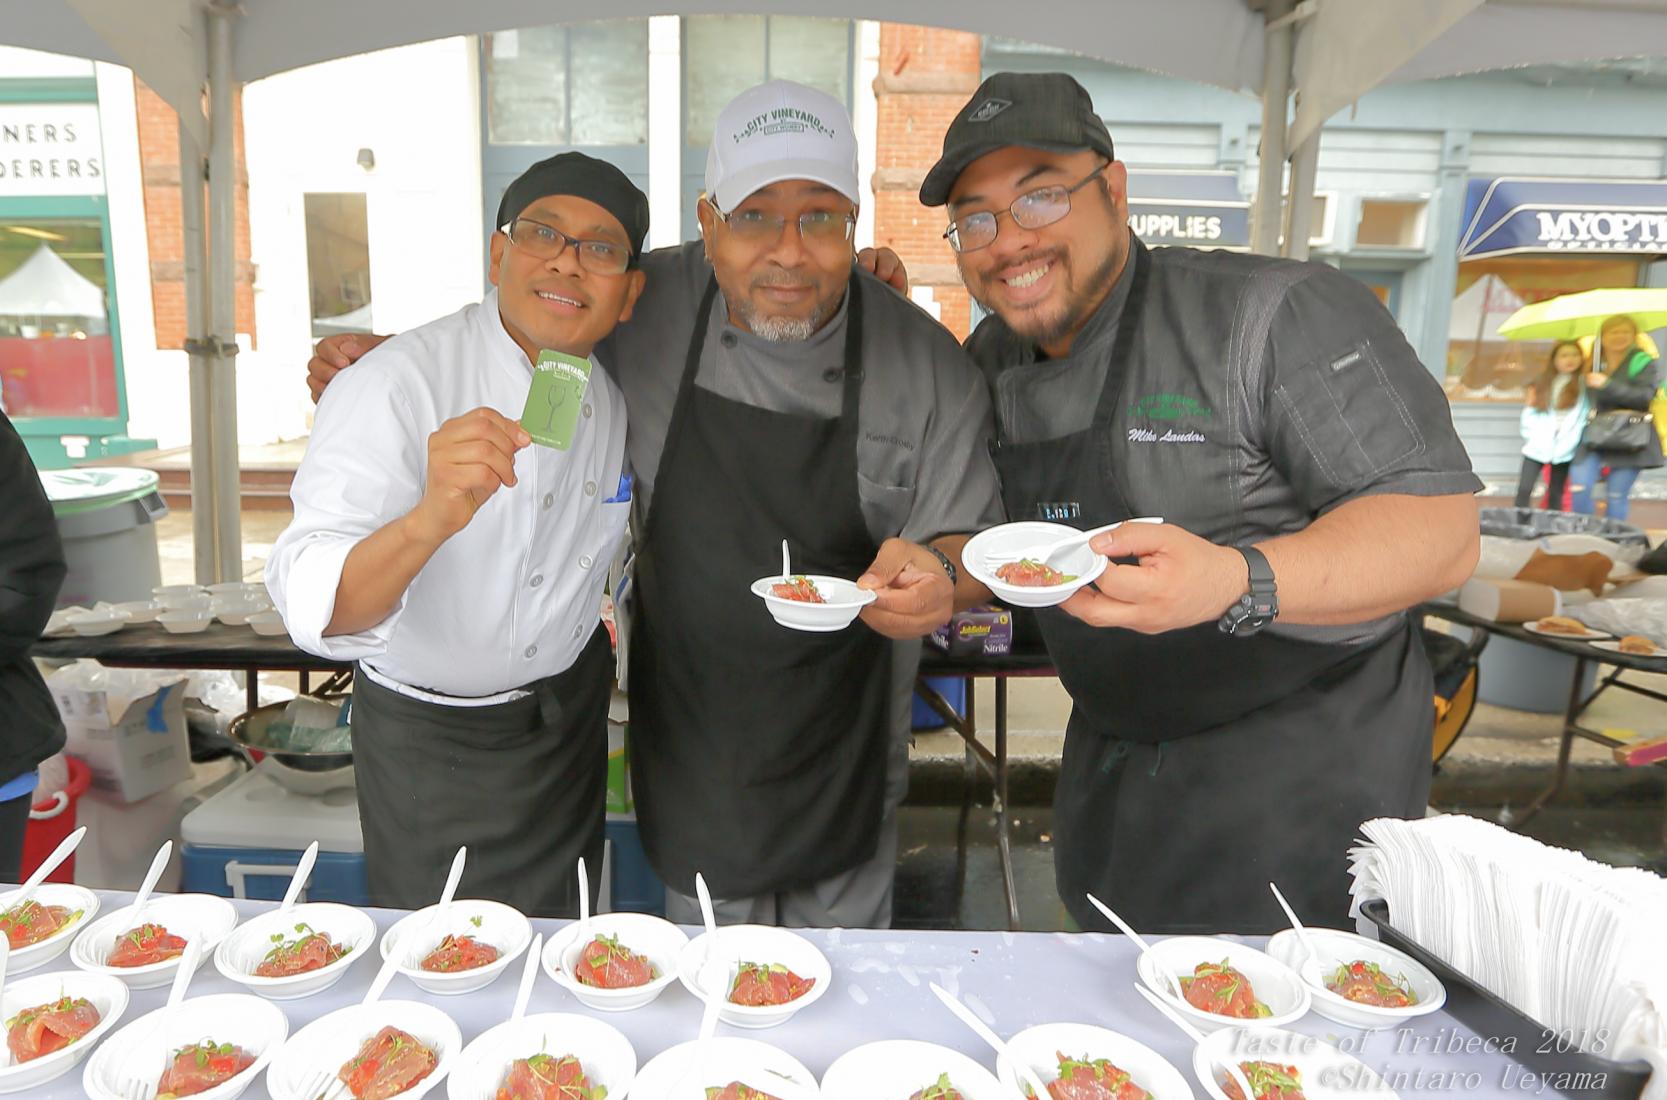 Celebrating 25 Years of Taste of Tribeca